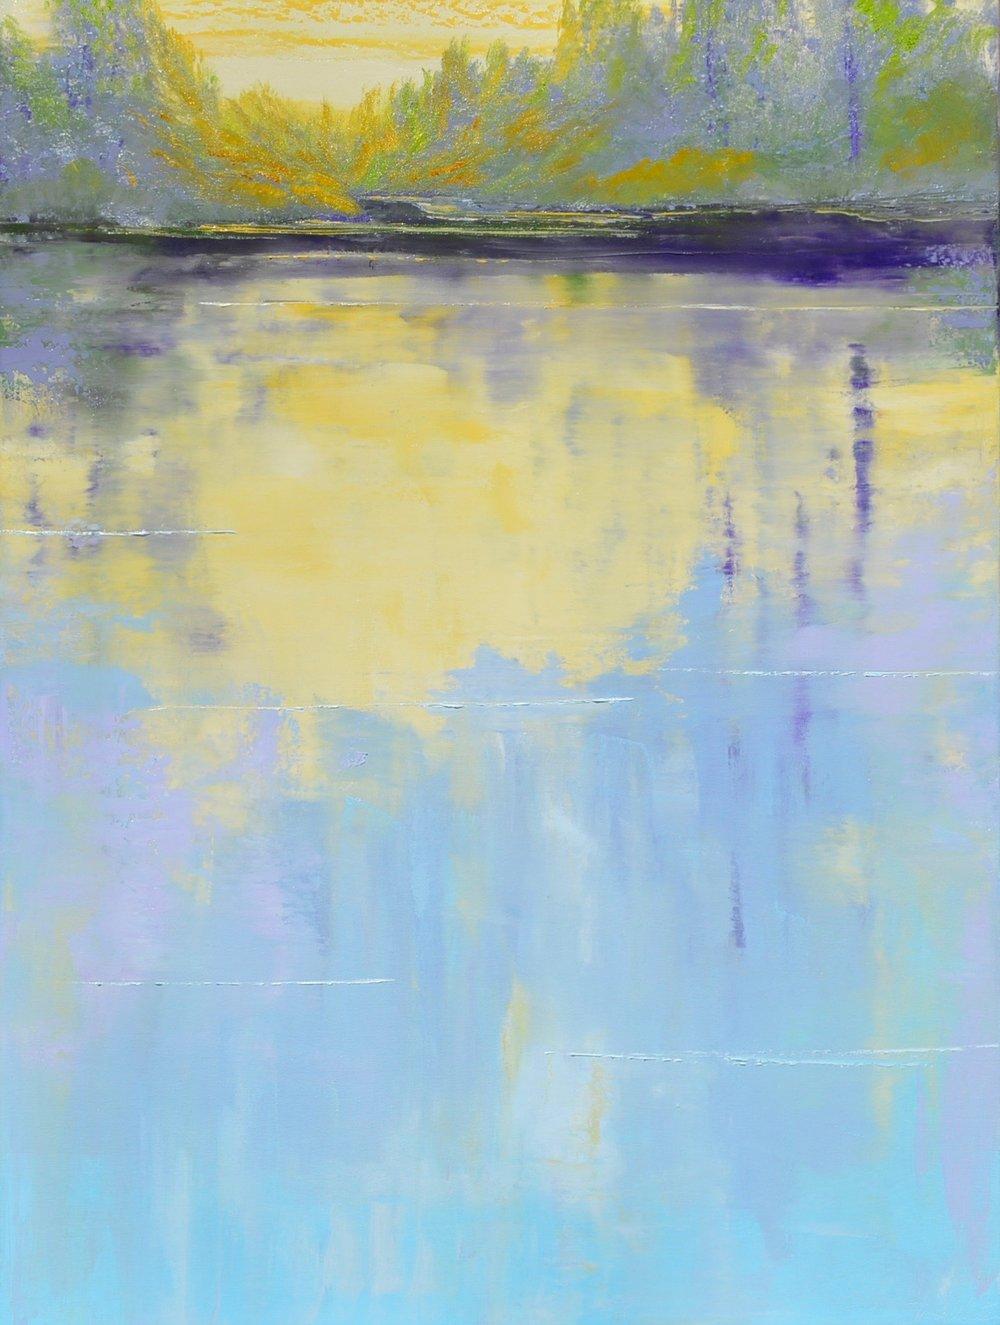 Dawn's Paintbrush